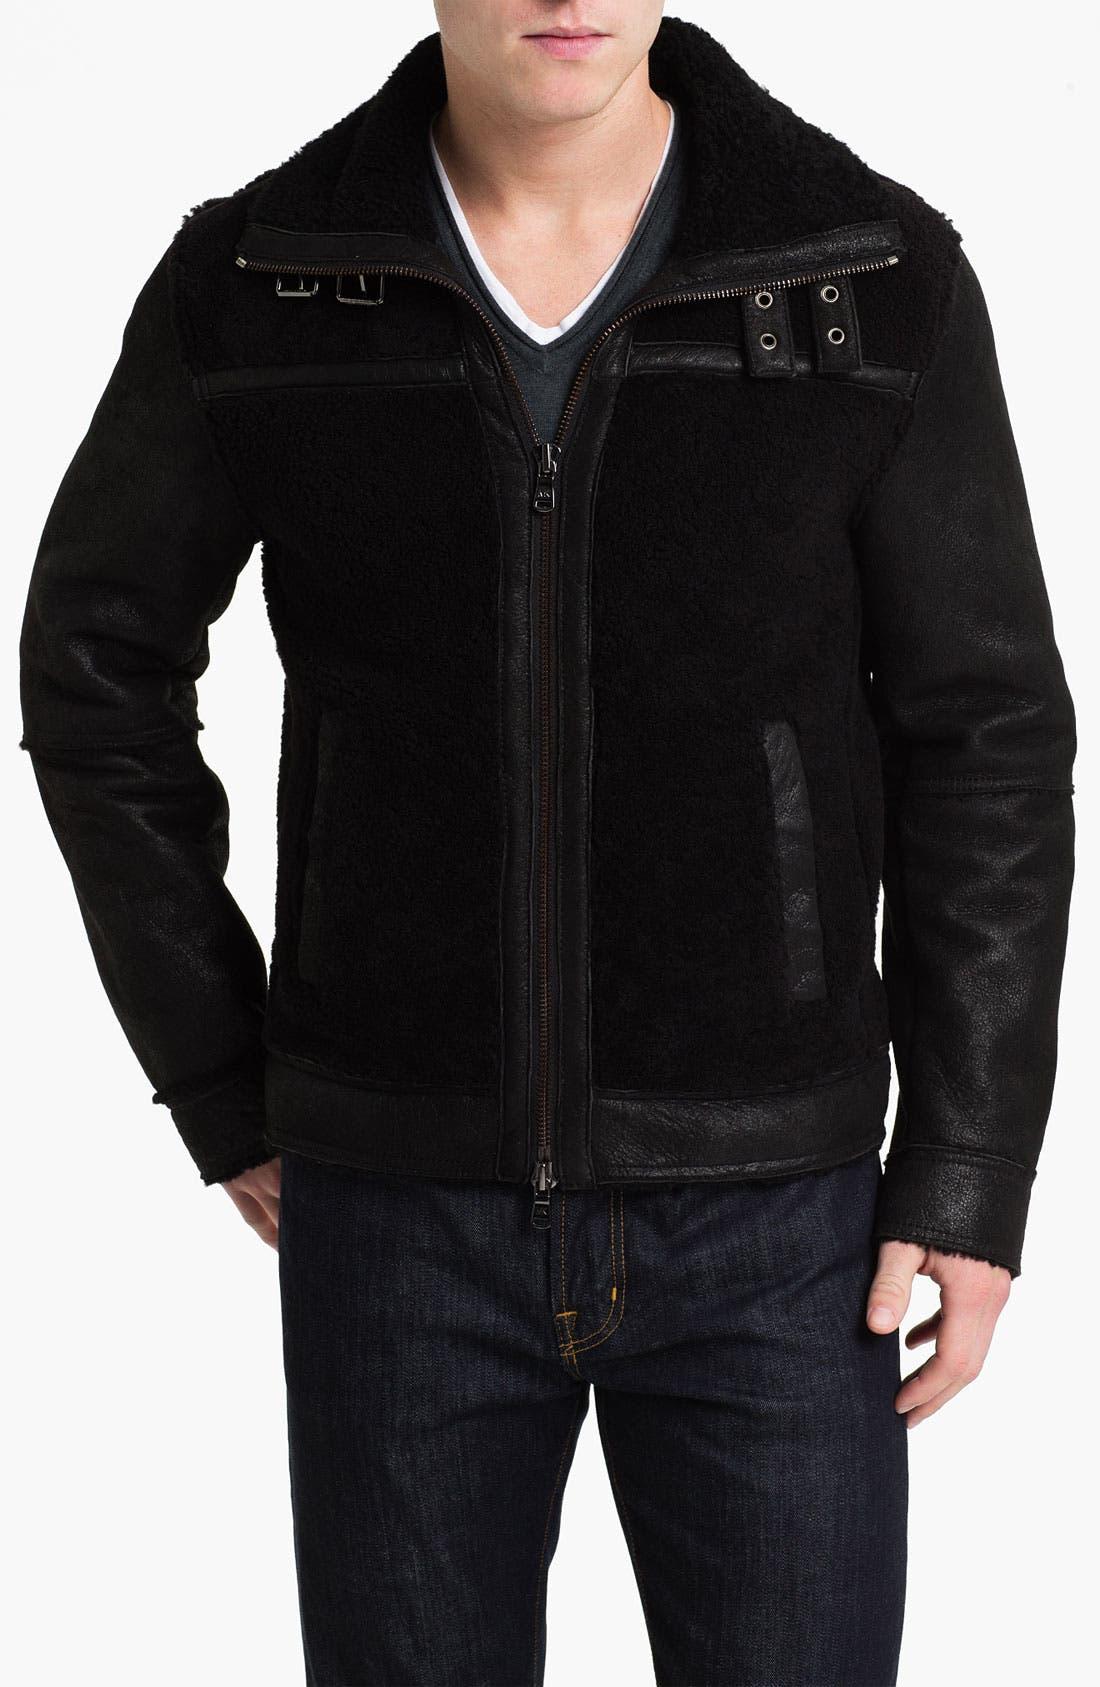 Alternate Image 1 Selected - Michael Kors Shearling Racer Jacket